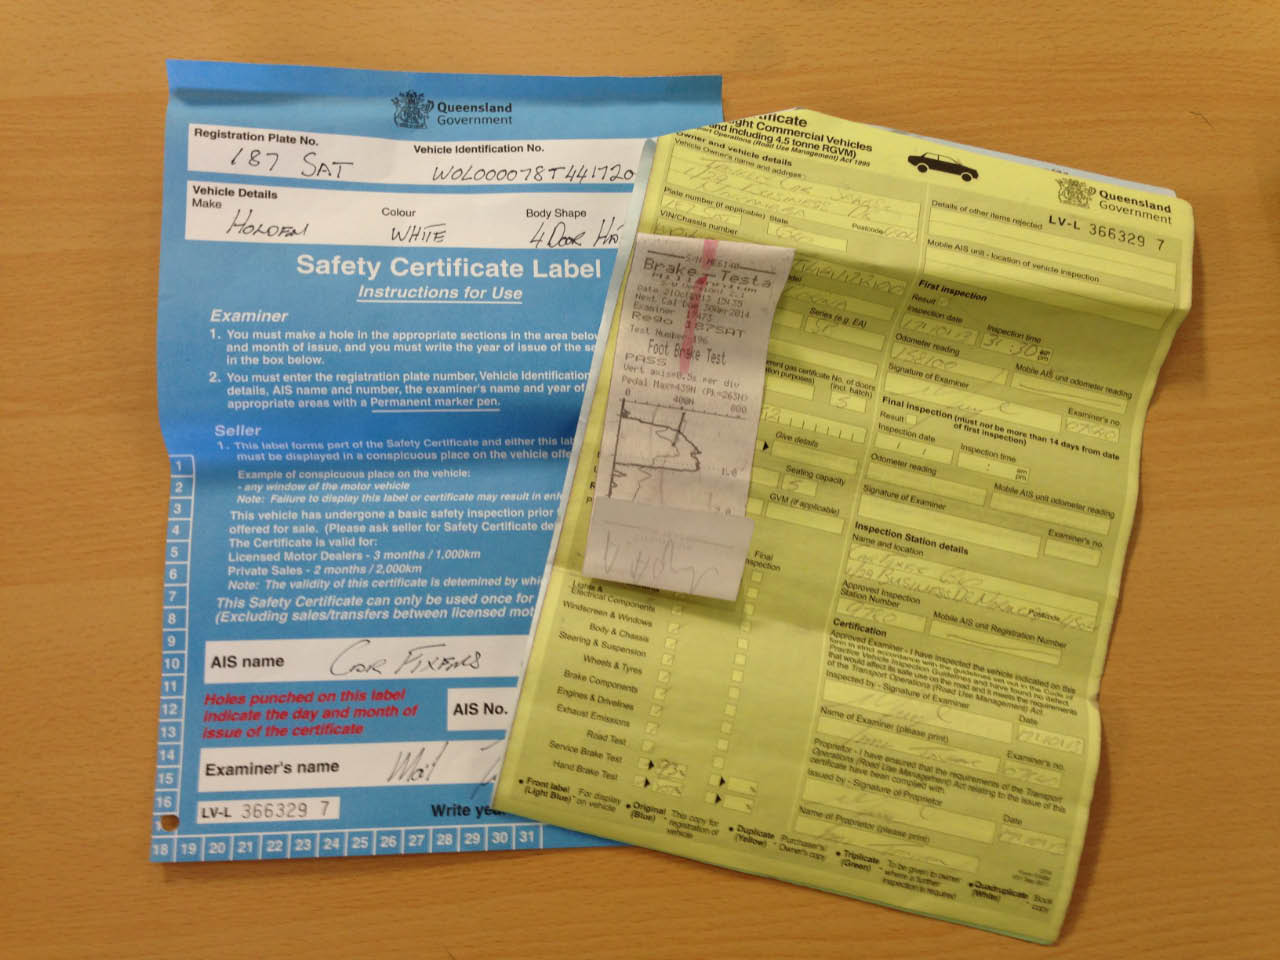 Compare Car iIsurance: Cheapest Car Insurance Qld